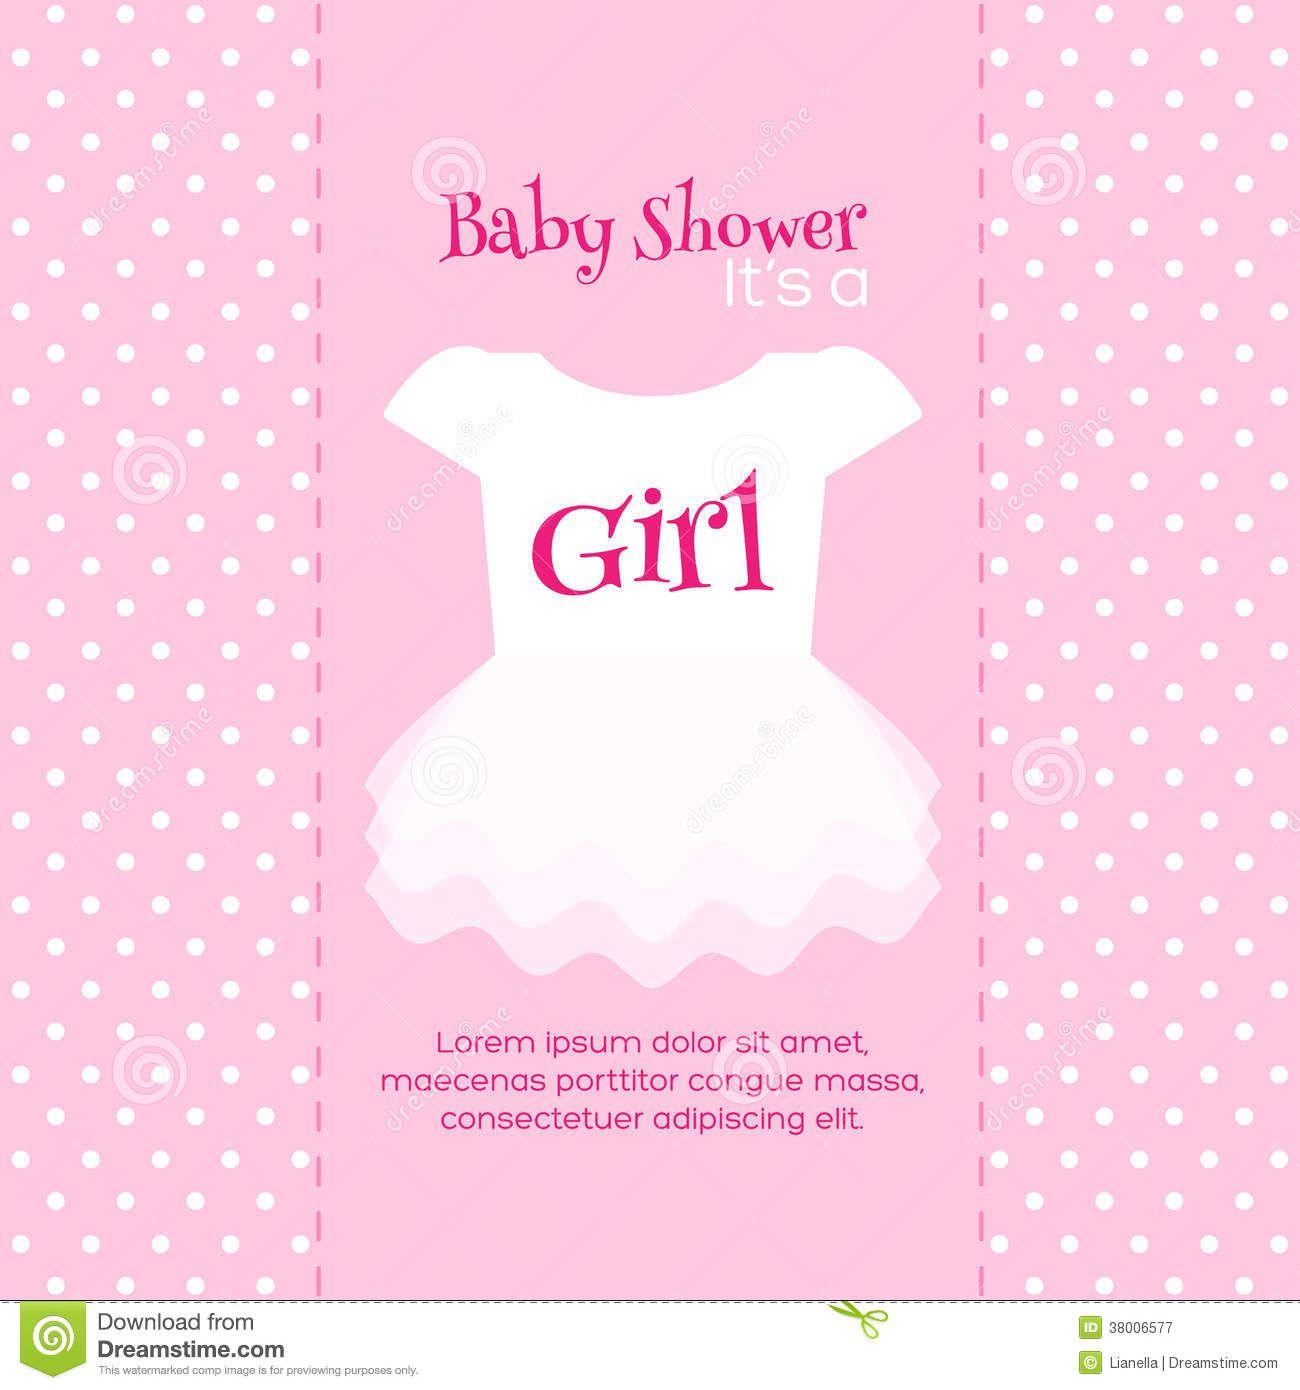 Design : Free Printable Baby Shower Invitations For Girls | Ckylares - Free Printable Baby Shower Invitation Maker